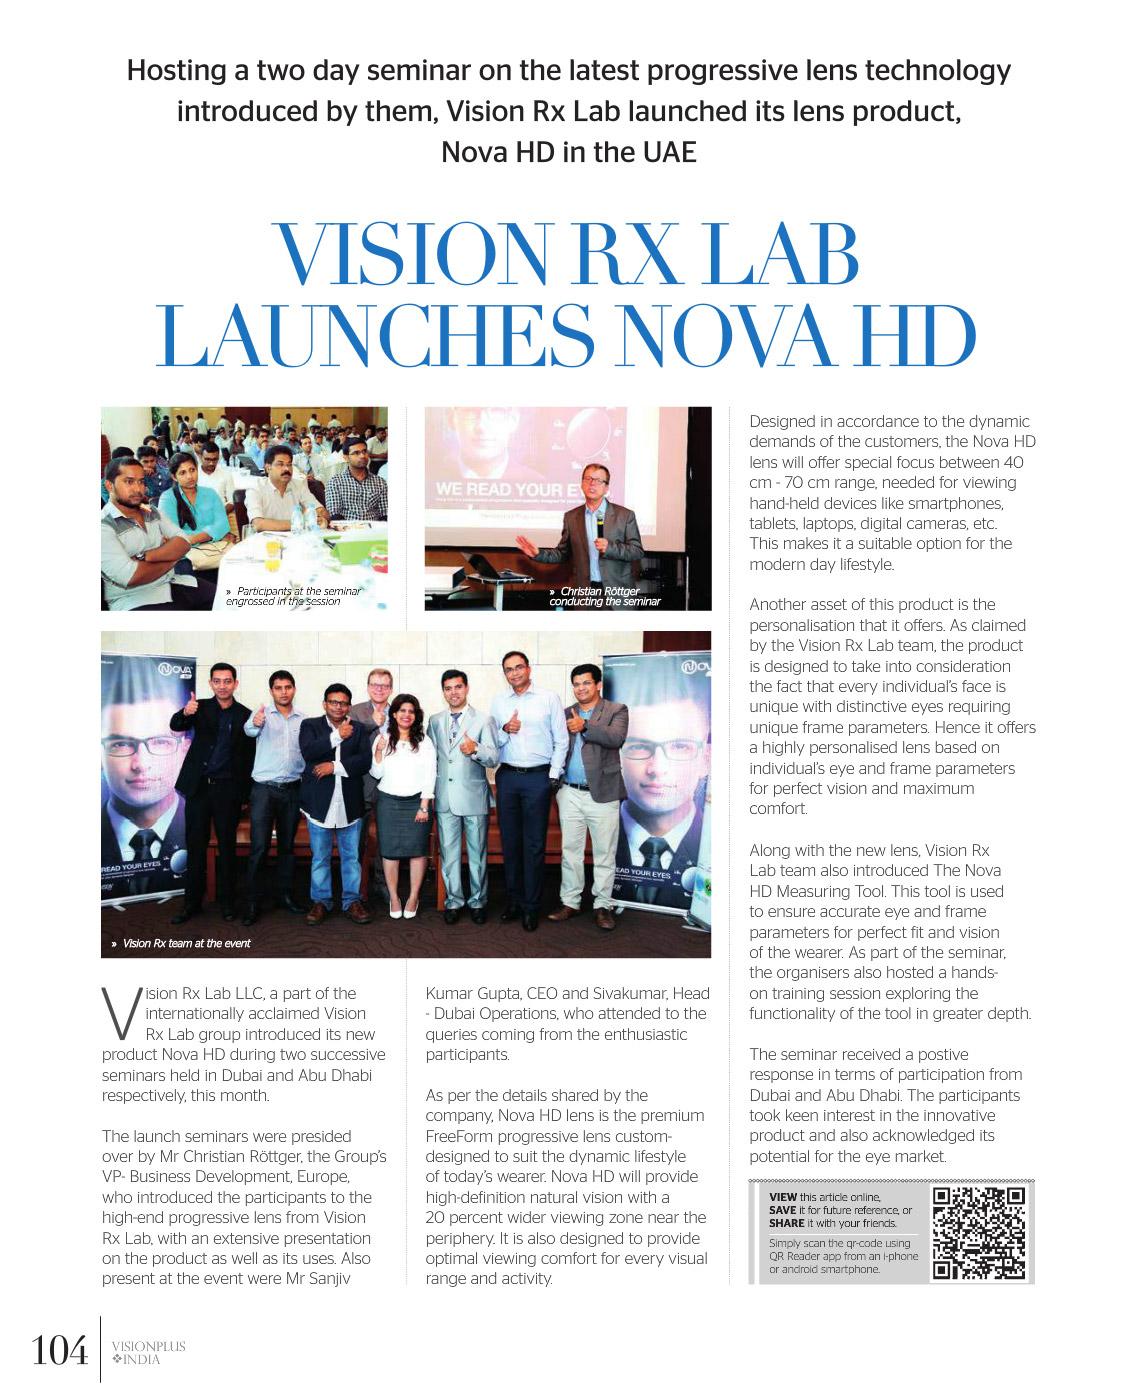 Vision Rx Lab Launches Nova HD